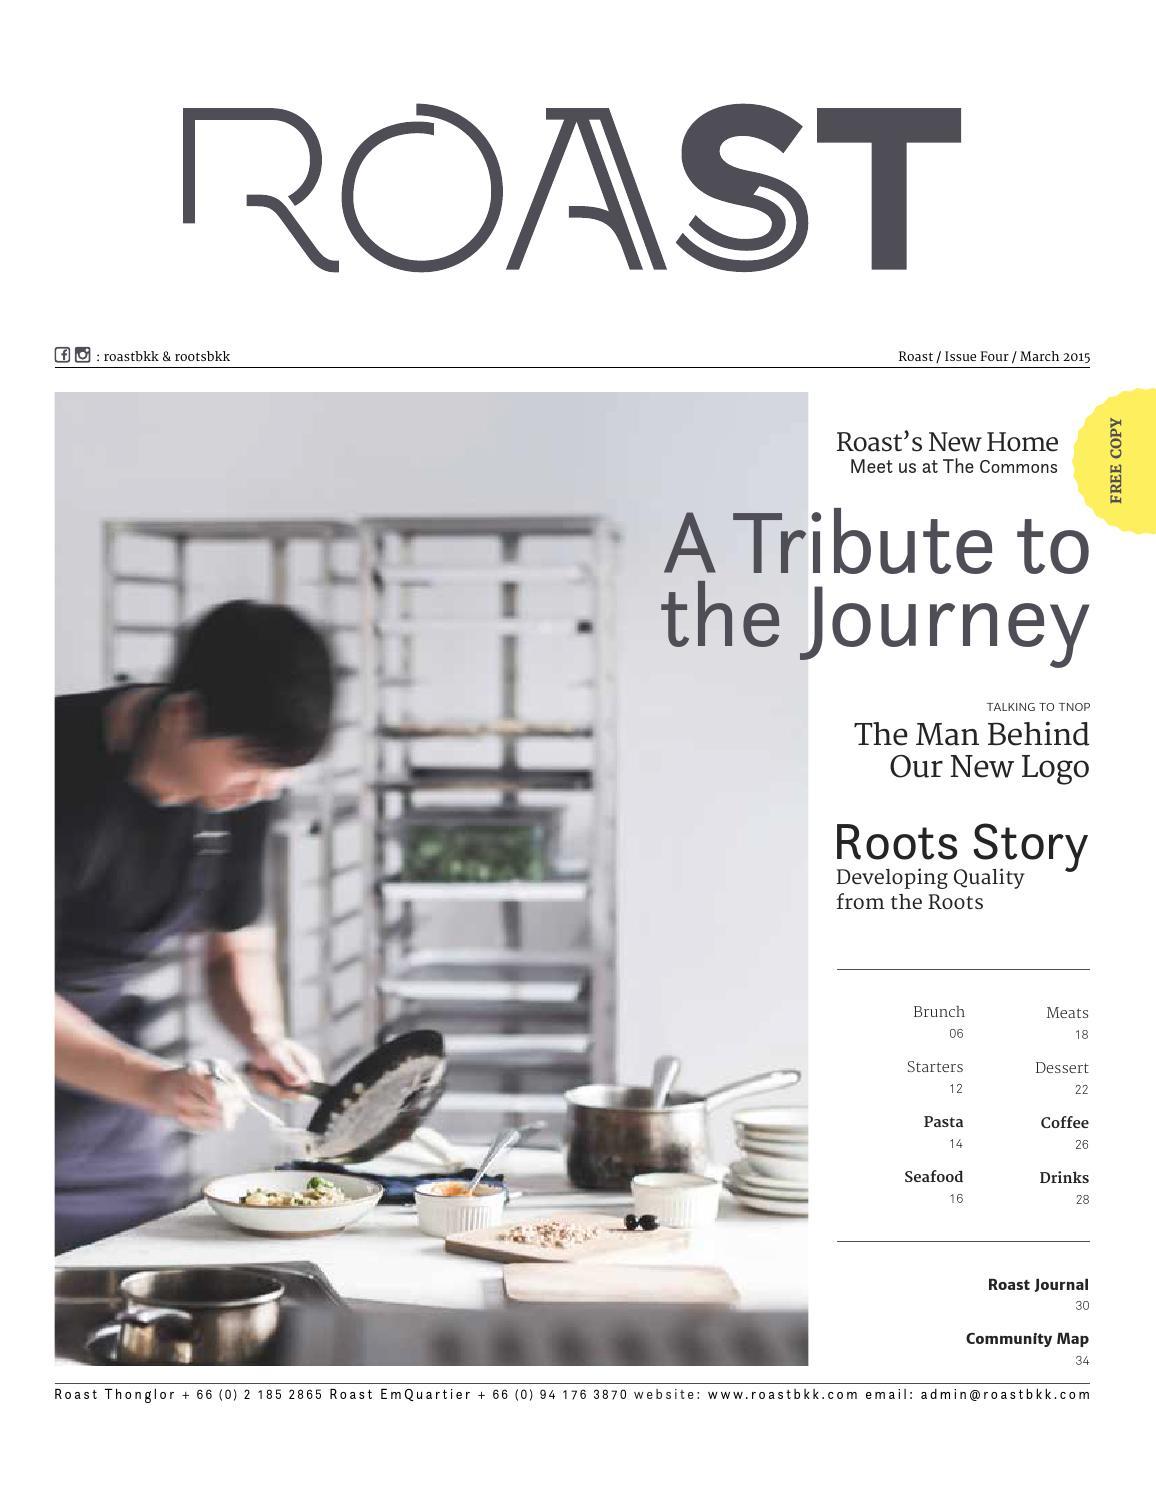 Roast Journal #4 by Pam Vivatsurakit - issuu